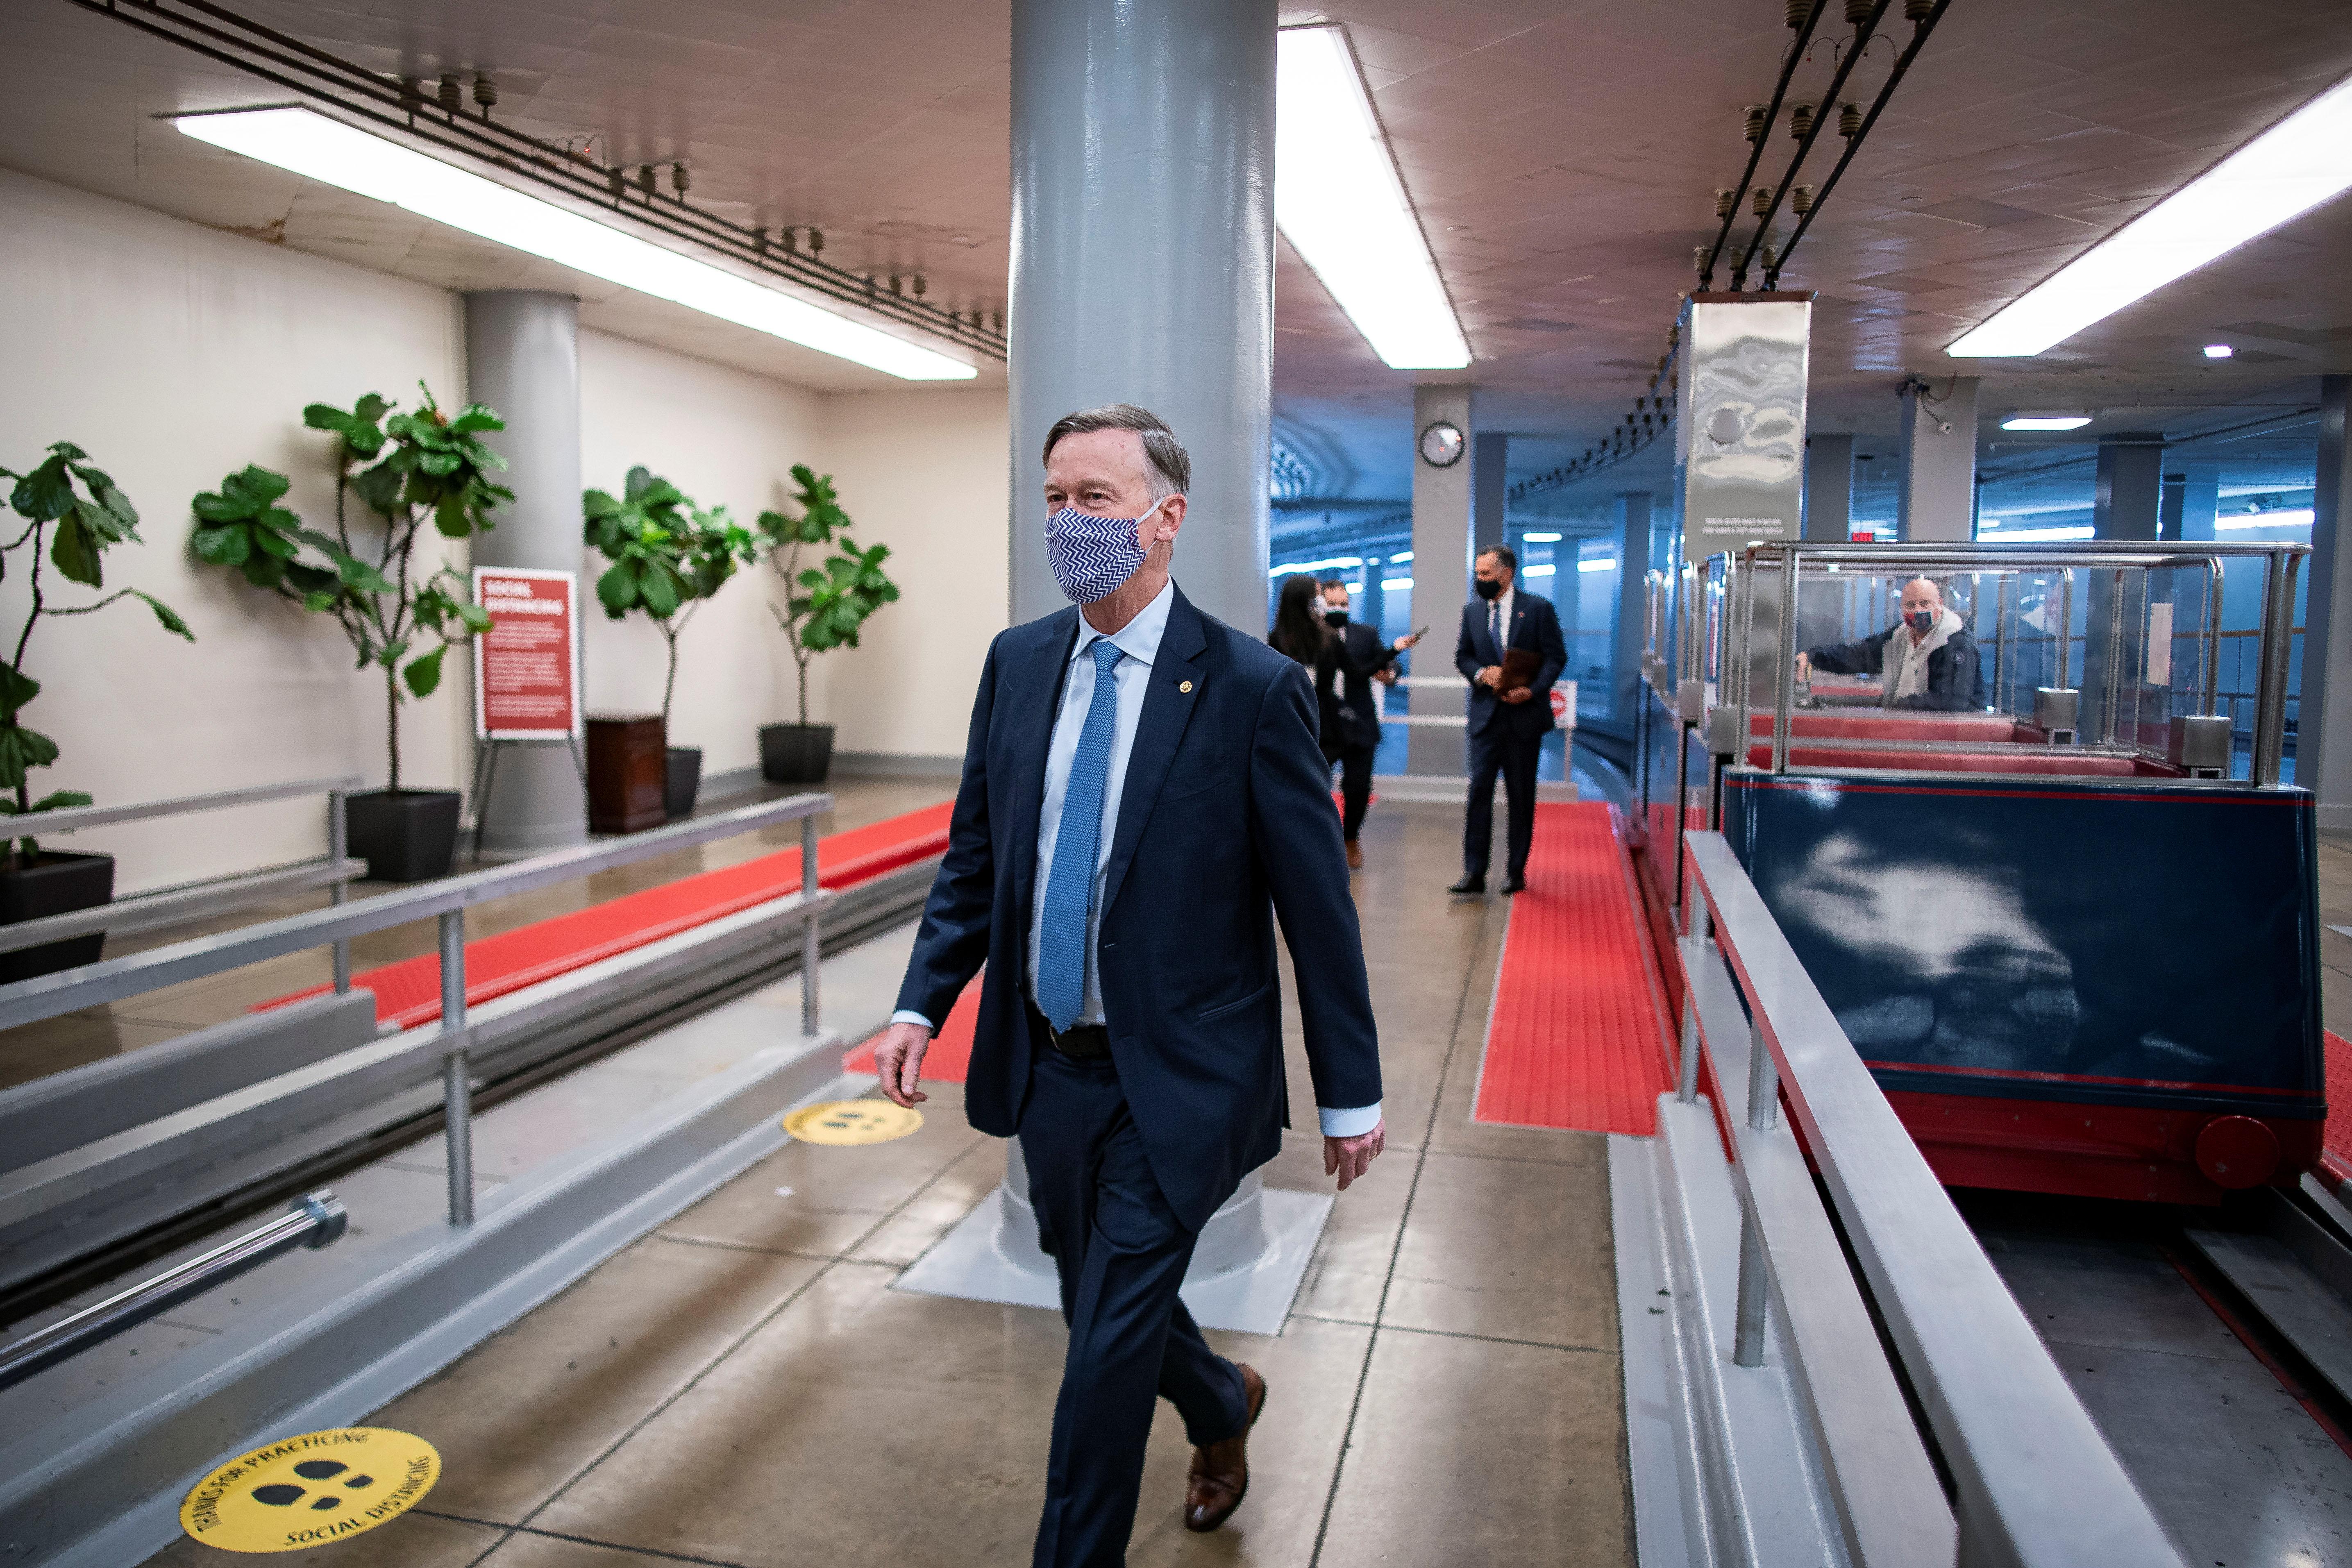 U.S. Senator John Hickenlooper (D-CO) arrives for a vote in the basement of the U.S. Capitol in Washington, U.S., January 26, 2021. REUTERS/Al Drago